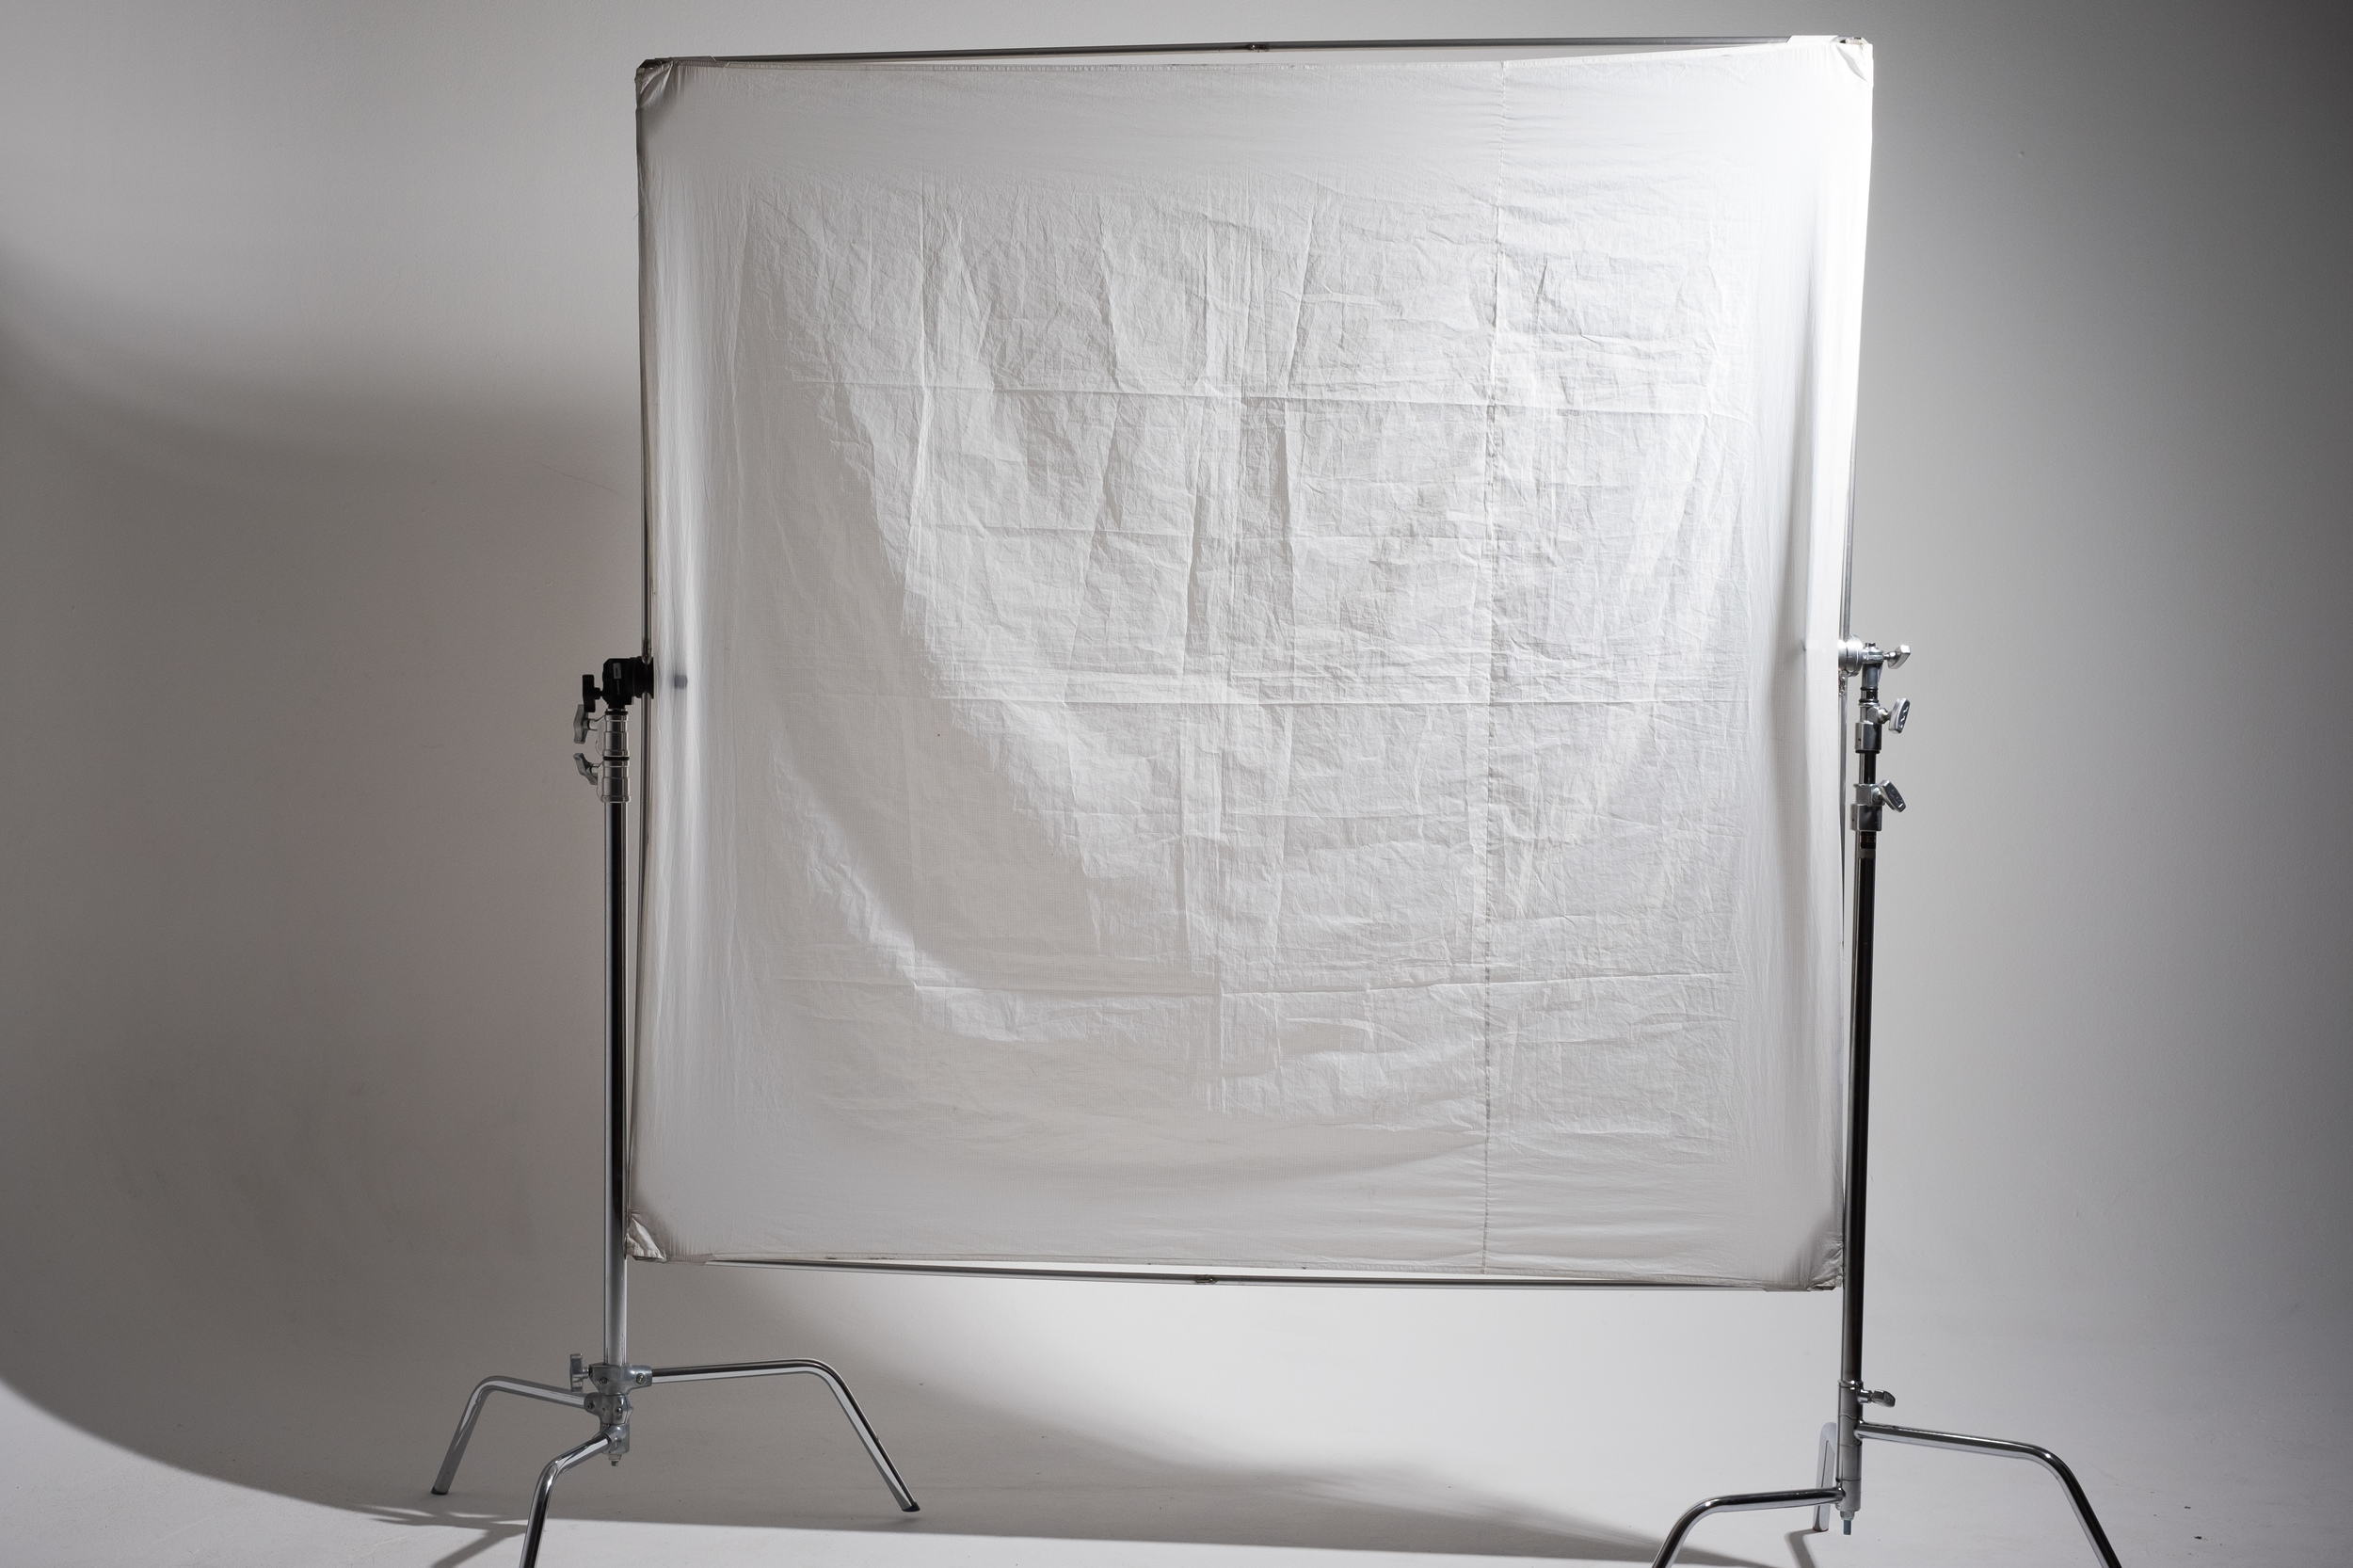 Chimera PRO panel 180x180 cm